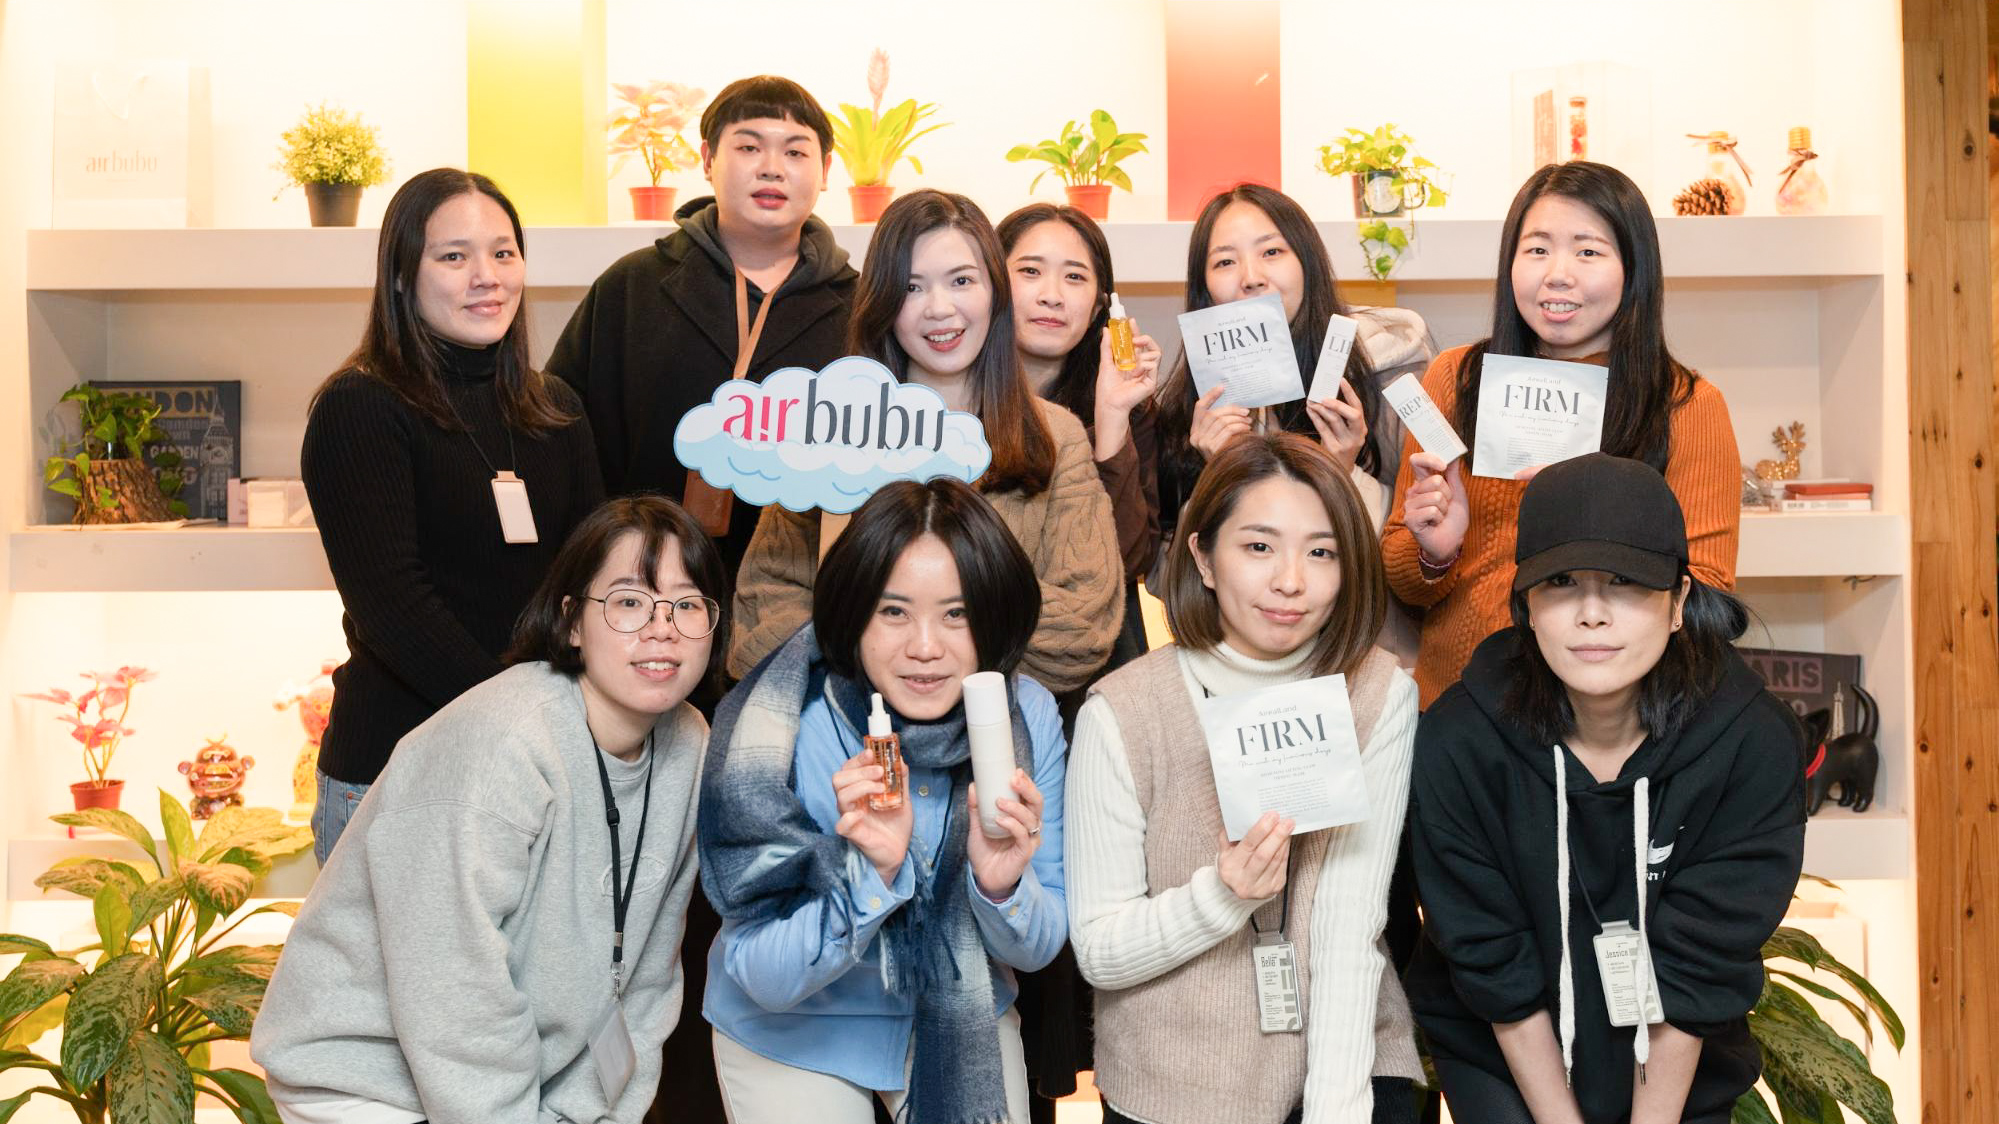 airbubu:行銷人跨界美妝,她靠什麼方法能在電商創立雙品牌?